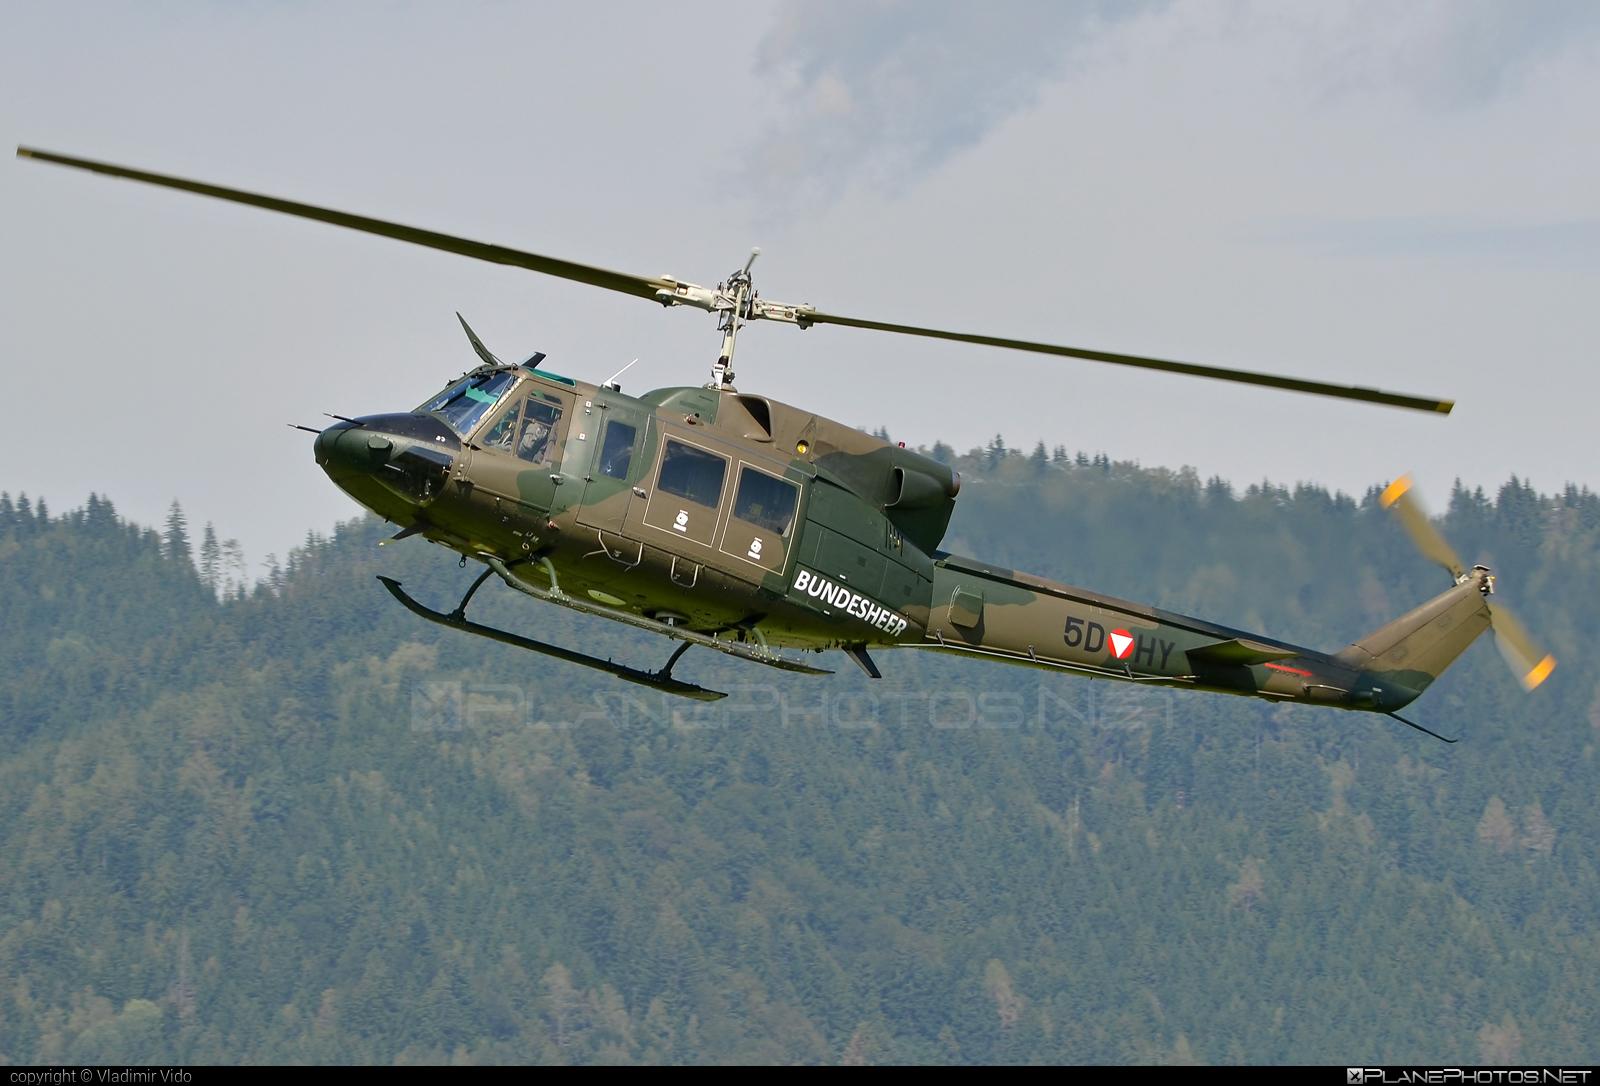 Bell 212 - 5D-HY operated by Österreichische Luftstreitkräfte (Austrian Air Force) #austrianairforce #bell #bell212 #bellhelicopters